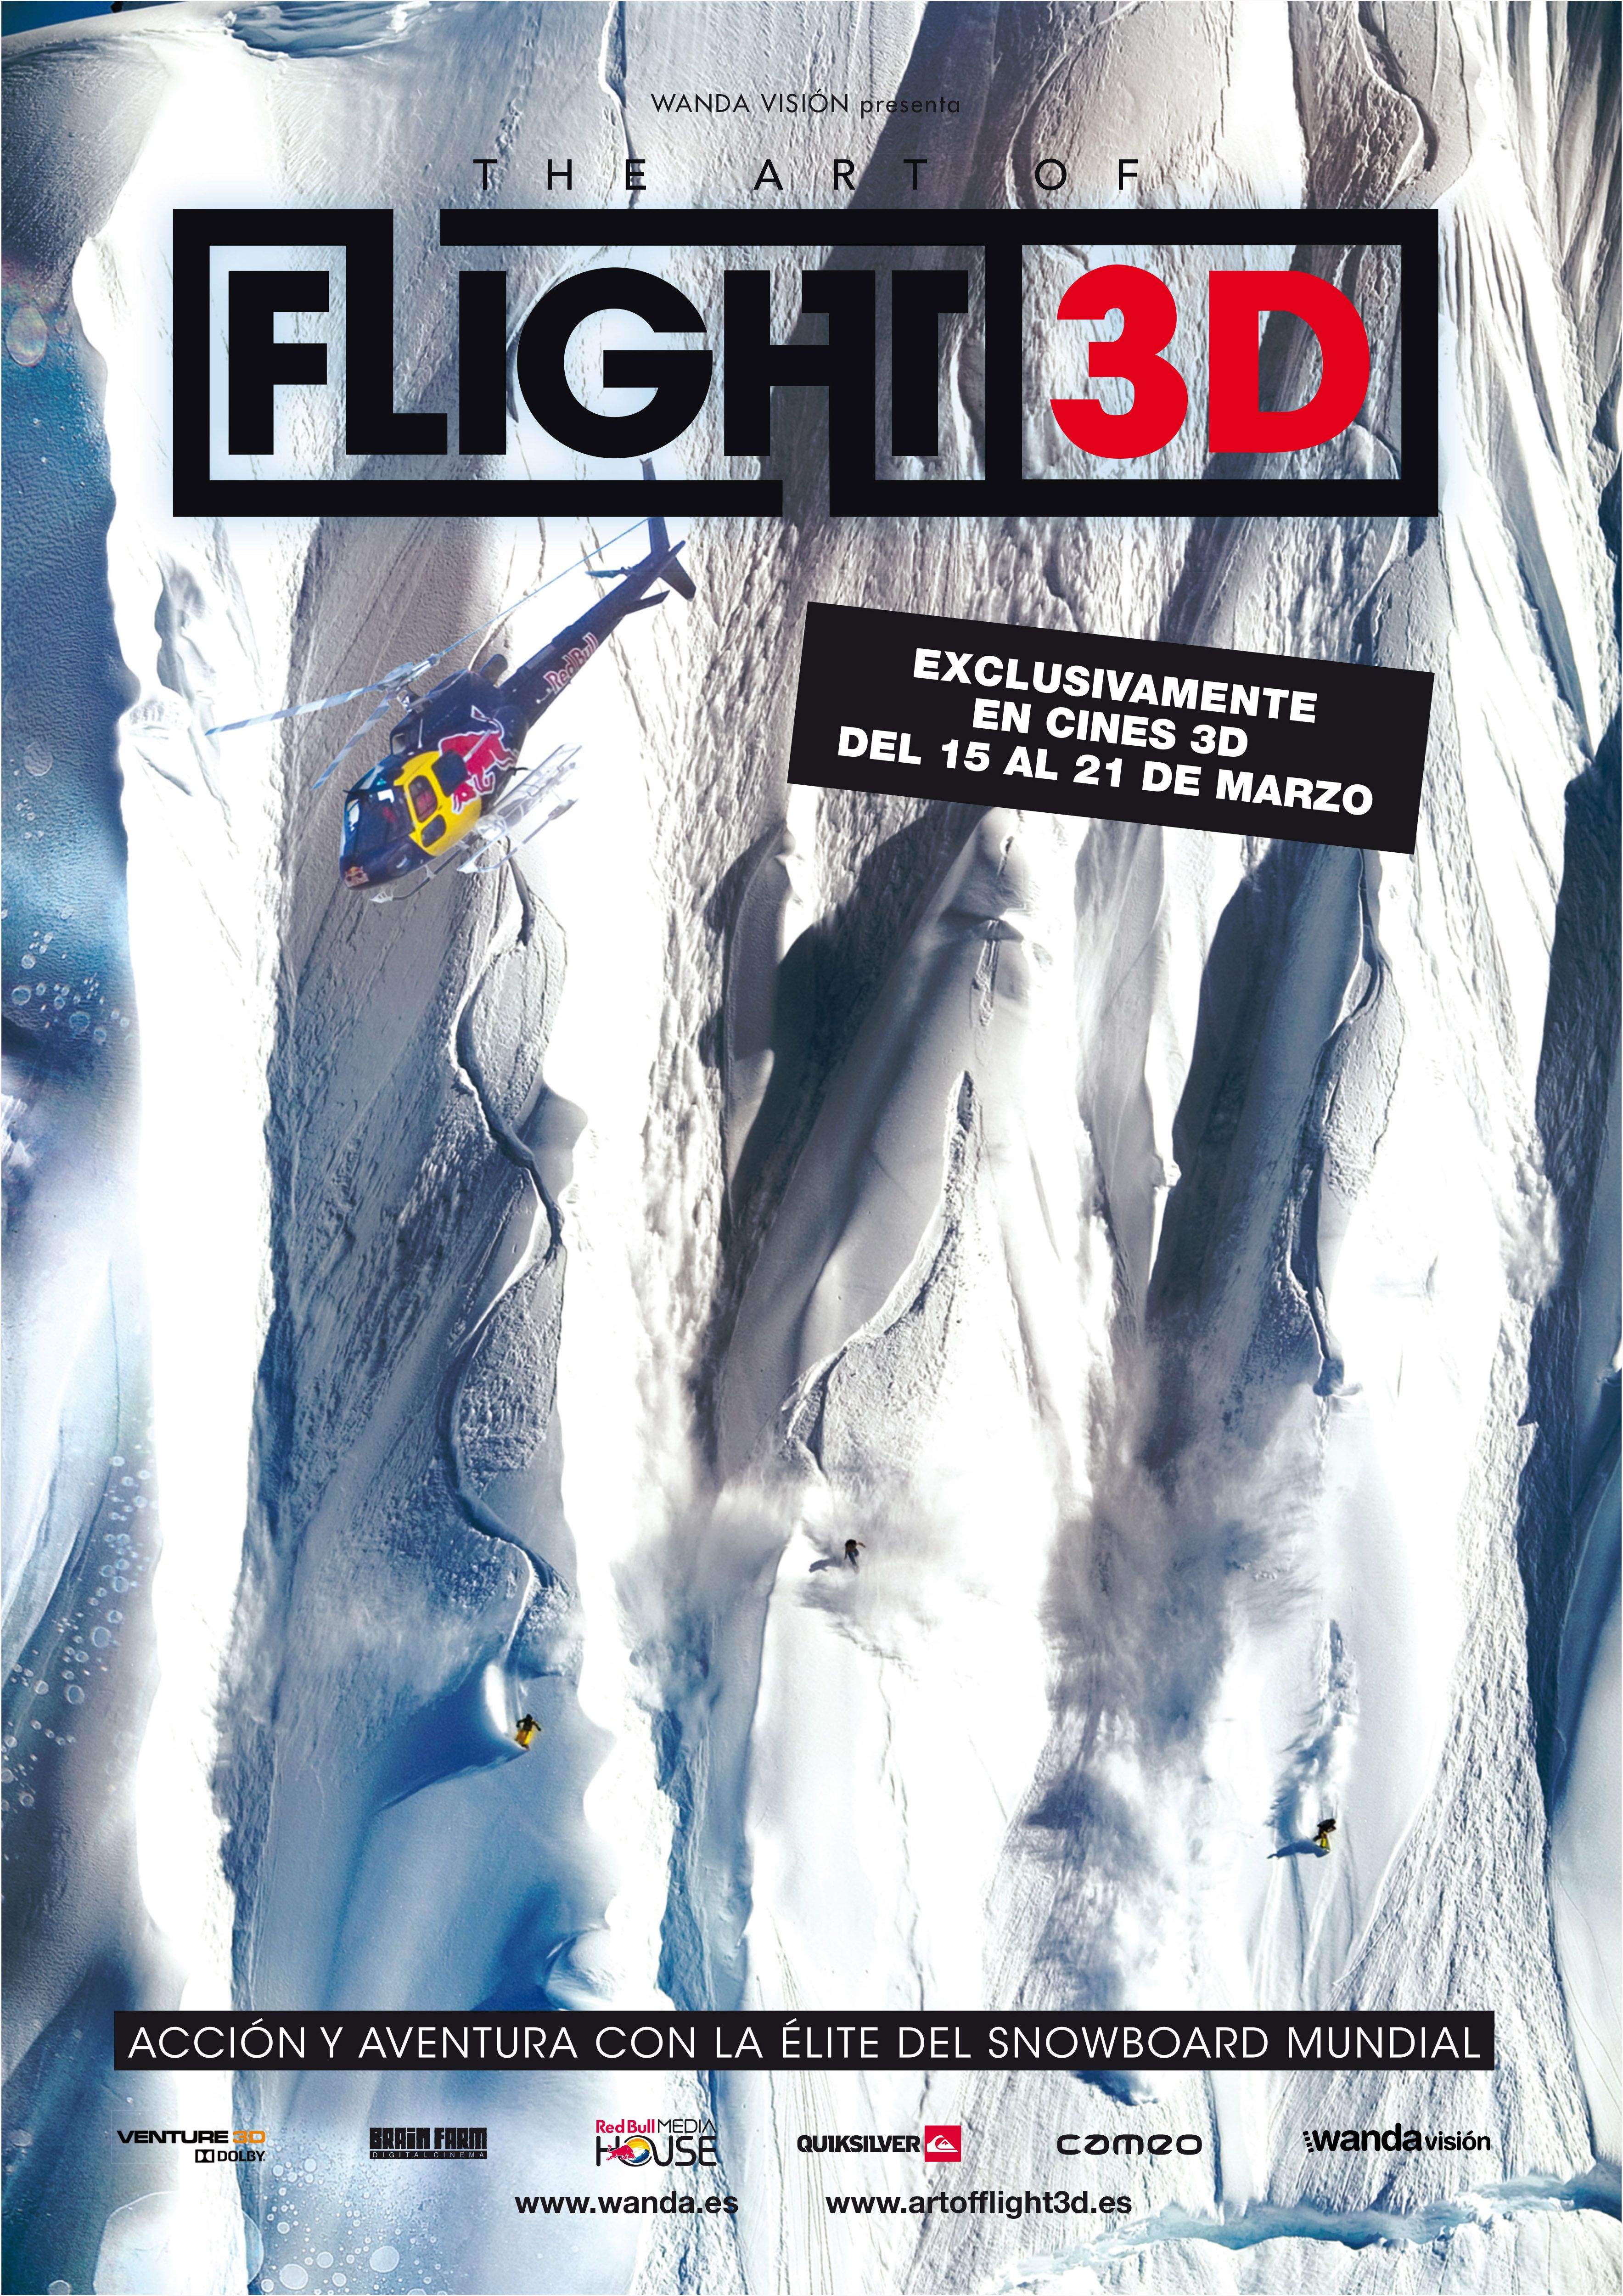 2011 /  The Art of flight 3D